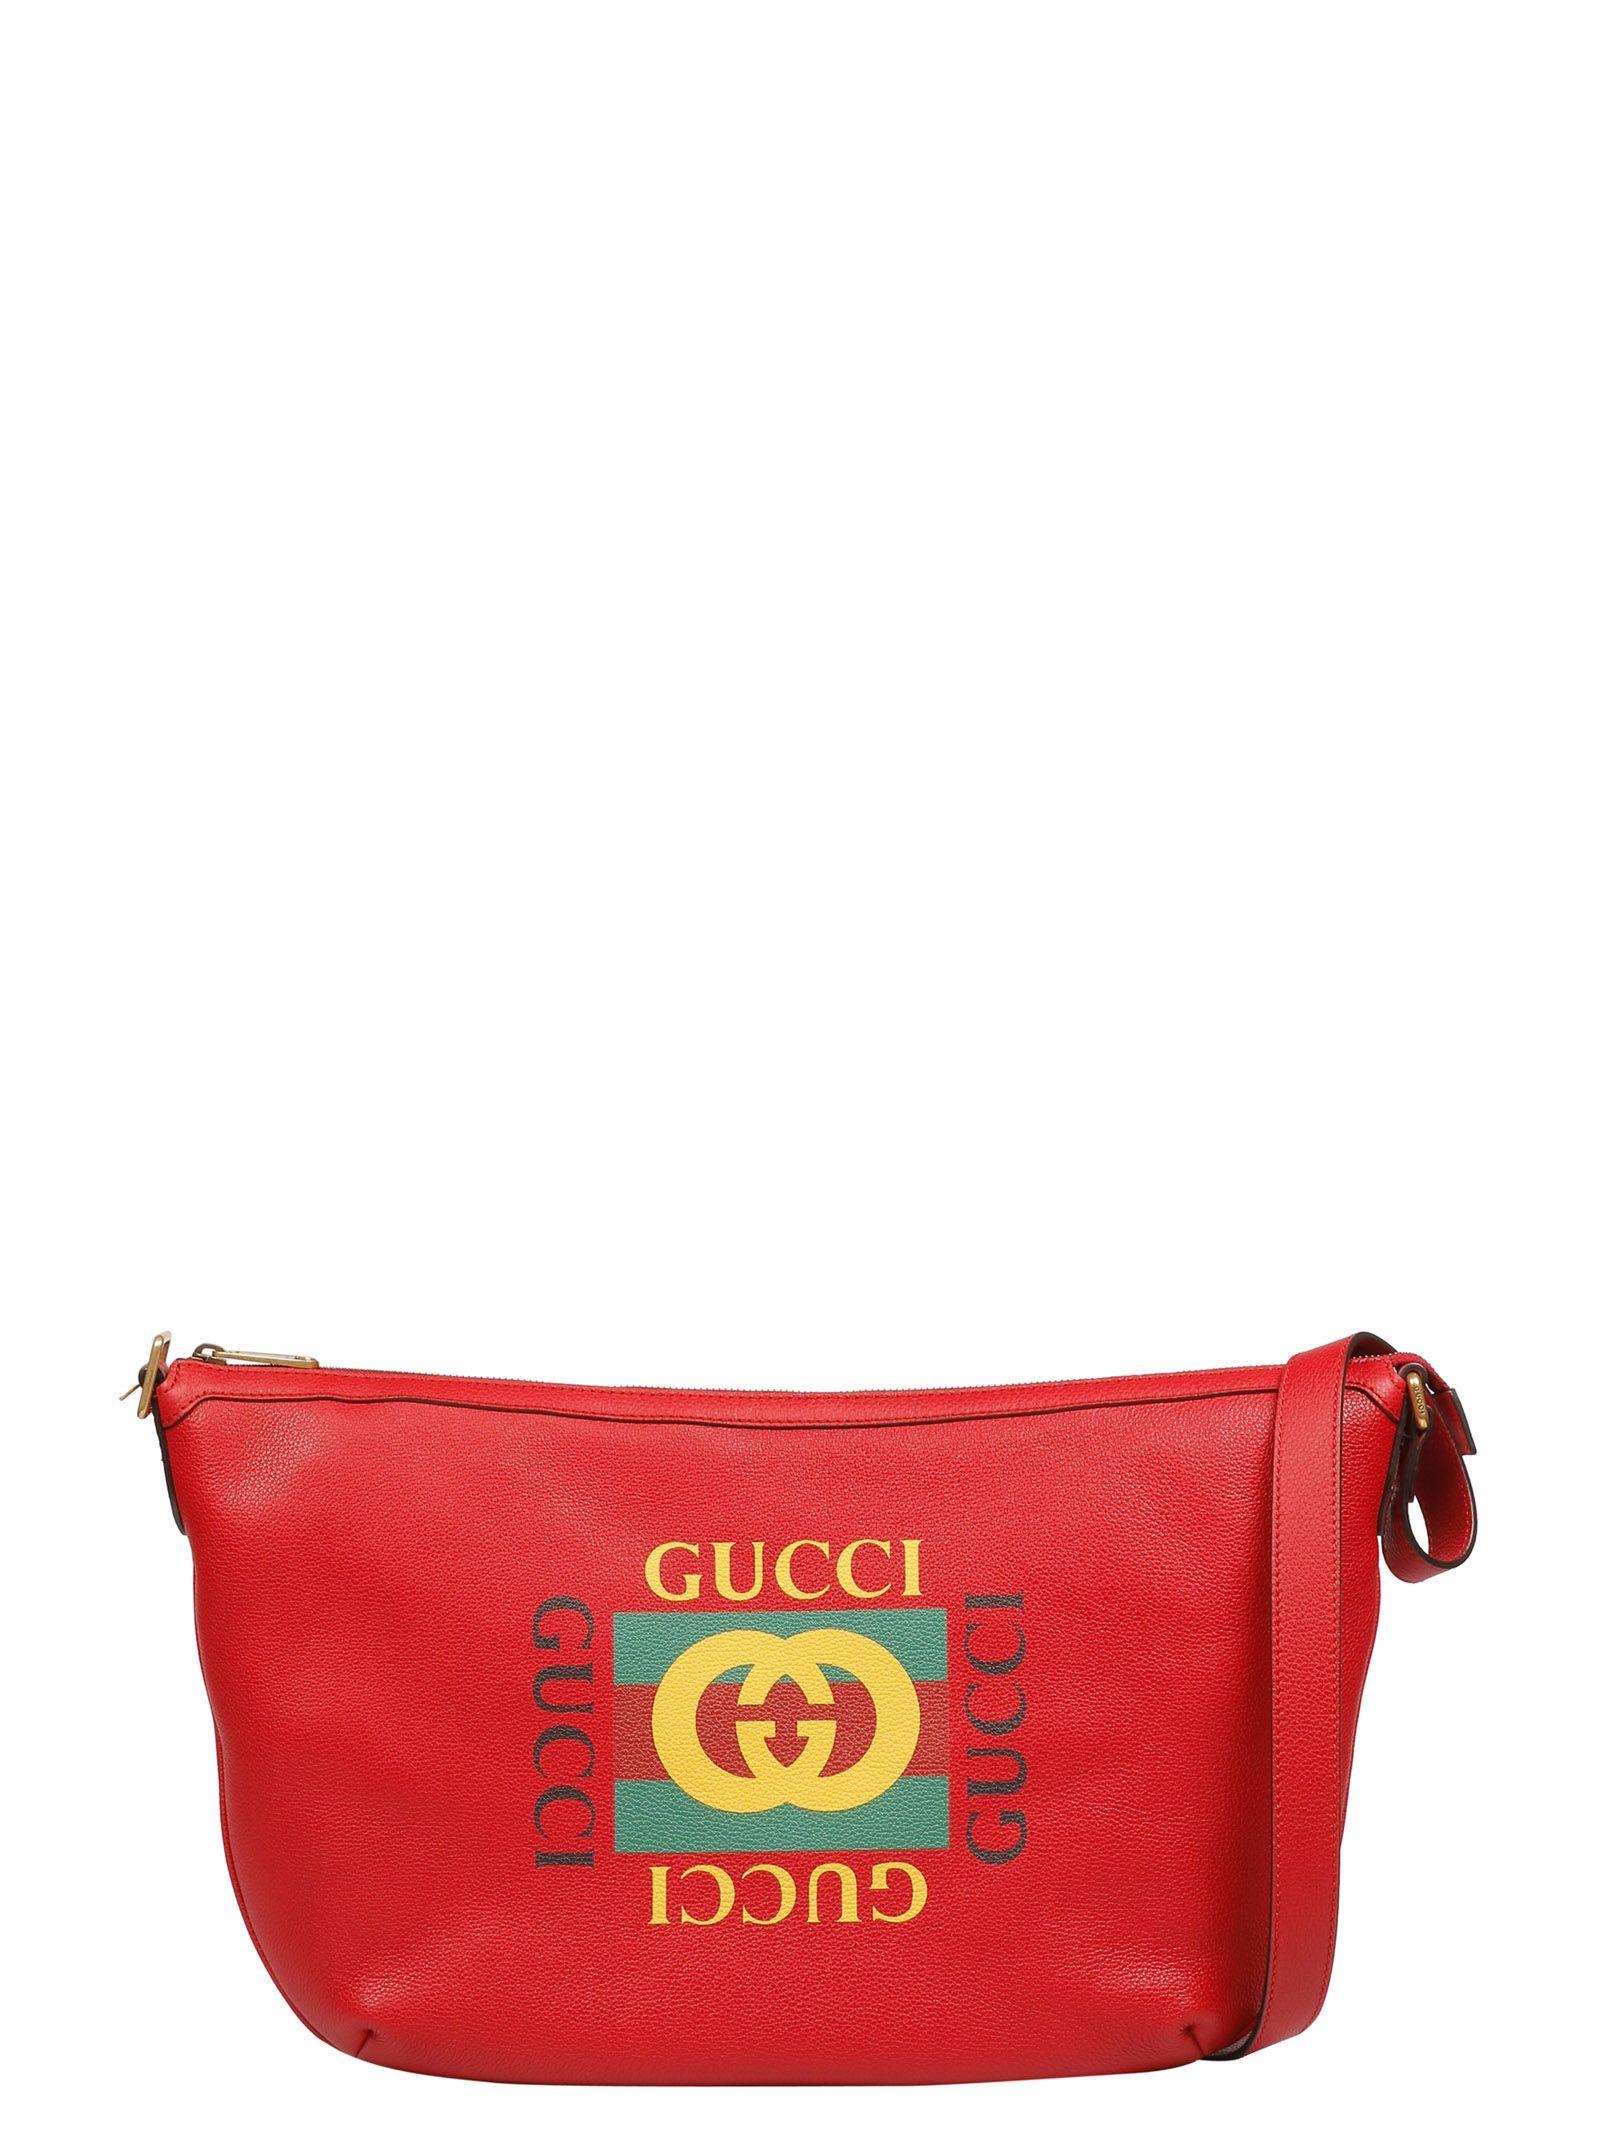 8b636506963247 GUCCI PRINT HALF-MOON HOBO BAG. #gucci #bags #shoulder bags #leather #hobo #